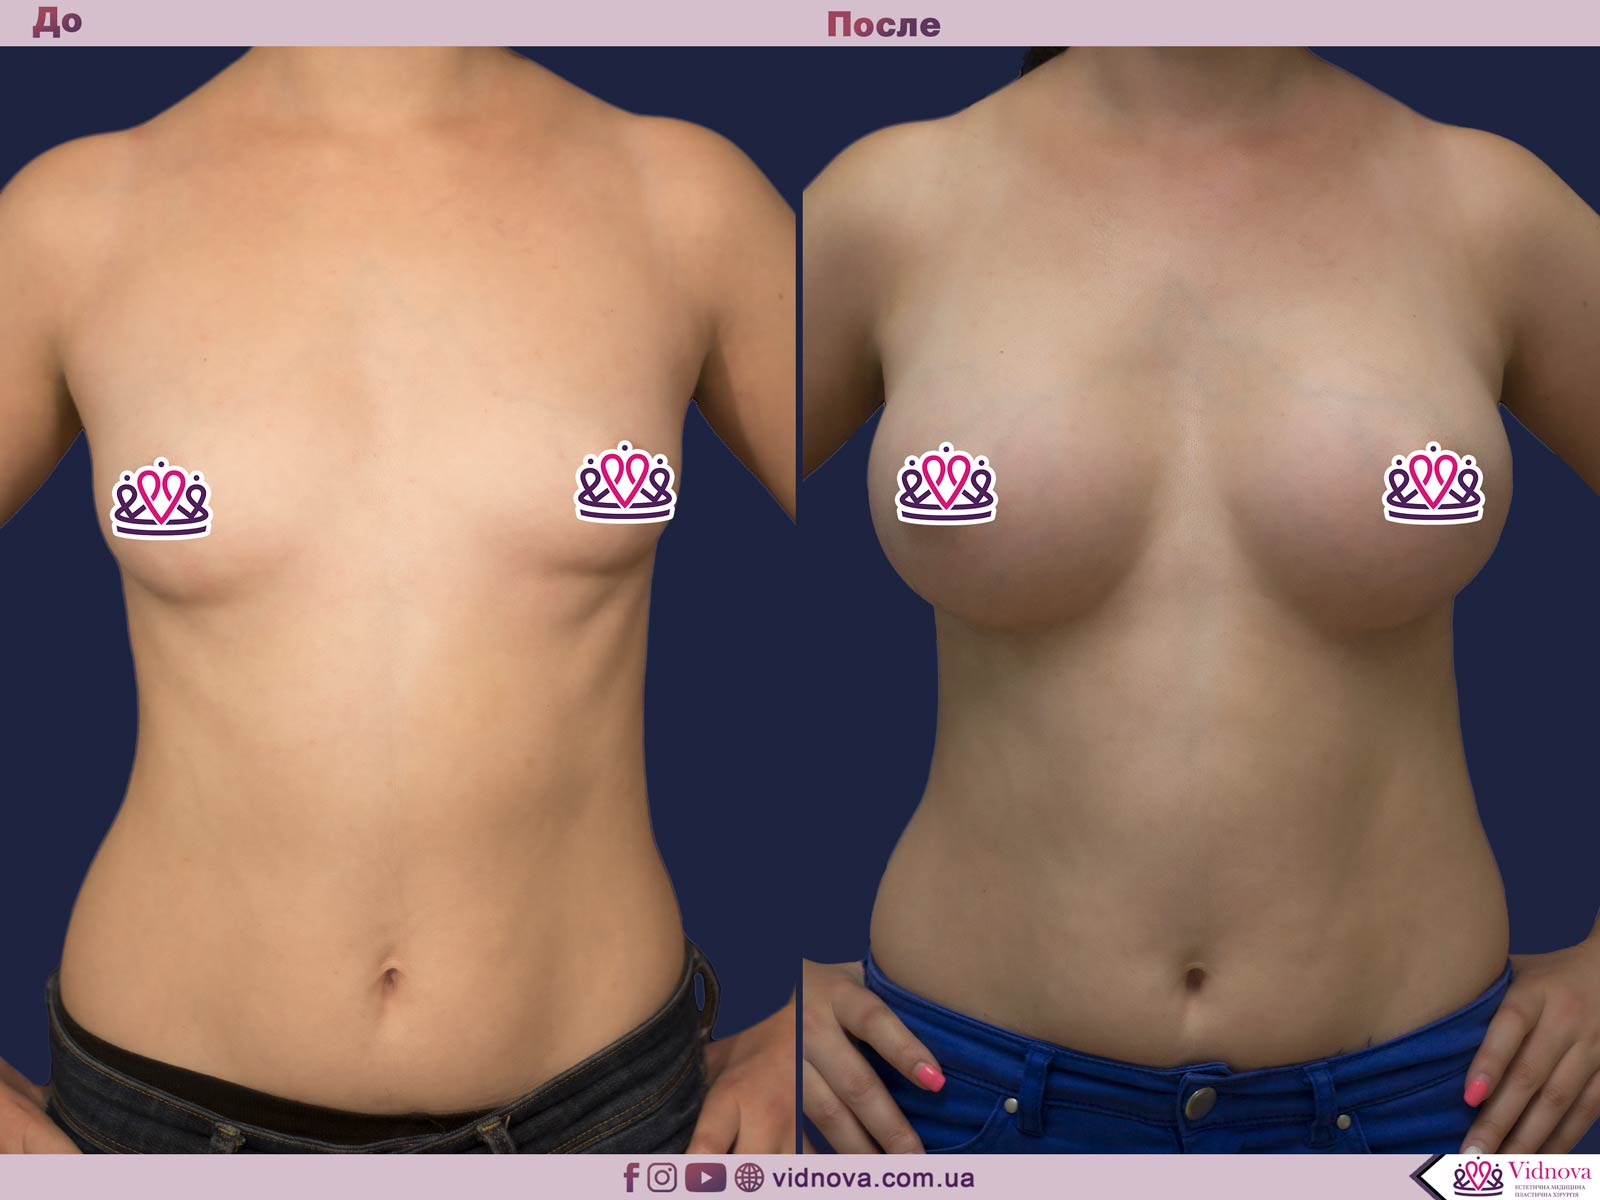 Увеличение груди: Фото ДО и ПОСЛЕ - Пример №72-1 - Клиника Vidnova